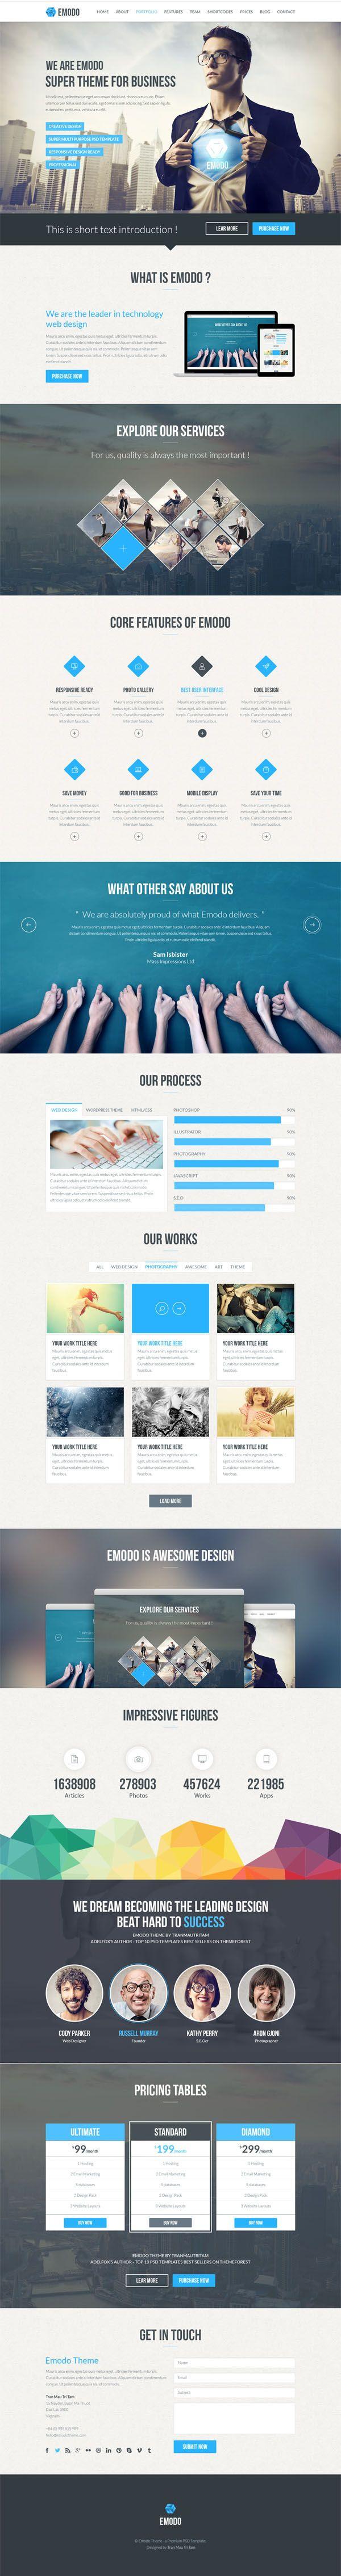 123 best Responsive Design images on Pinterest